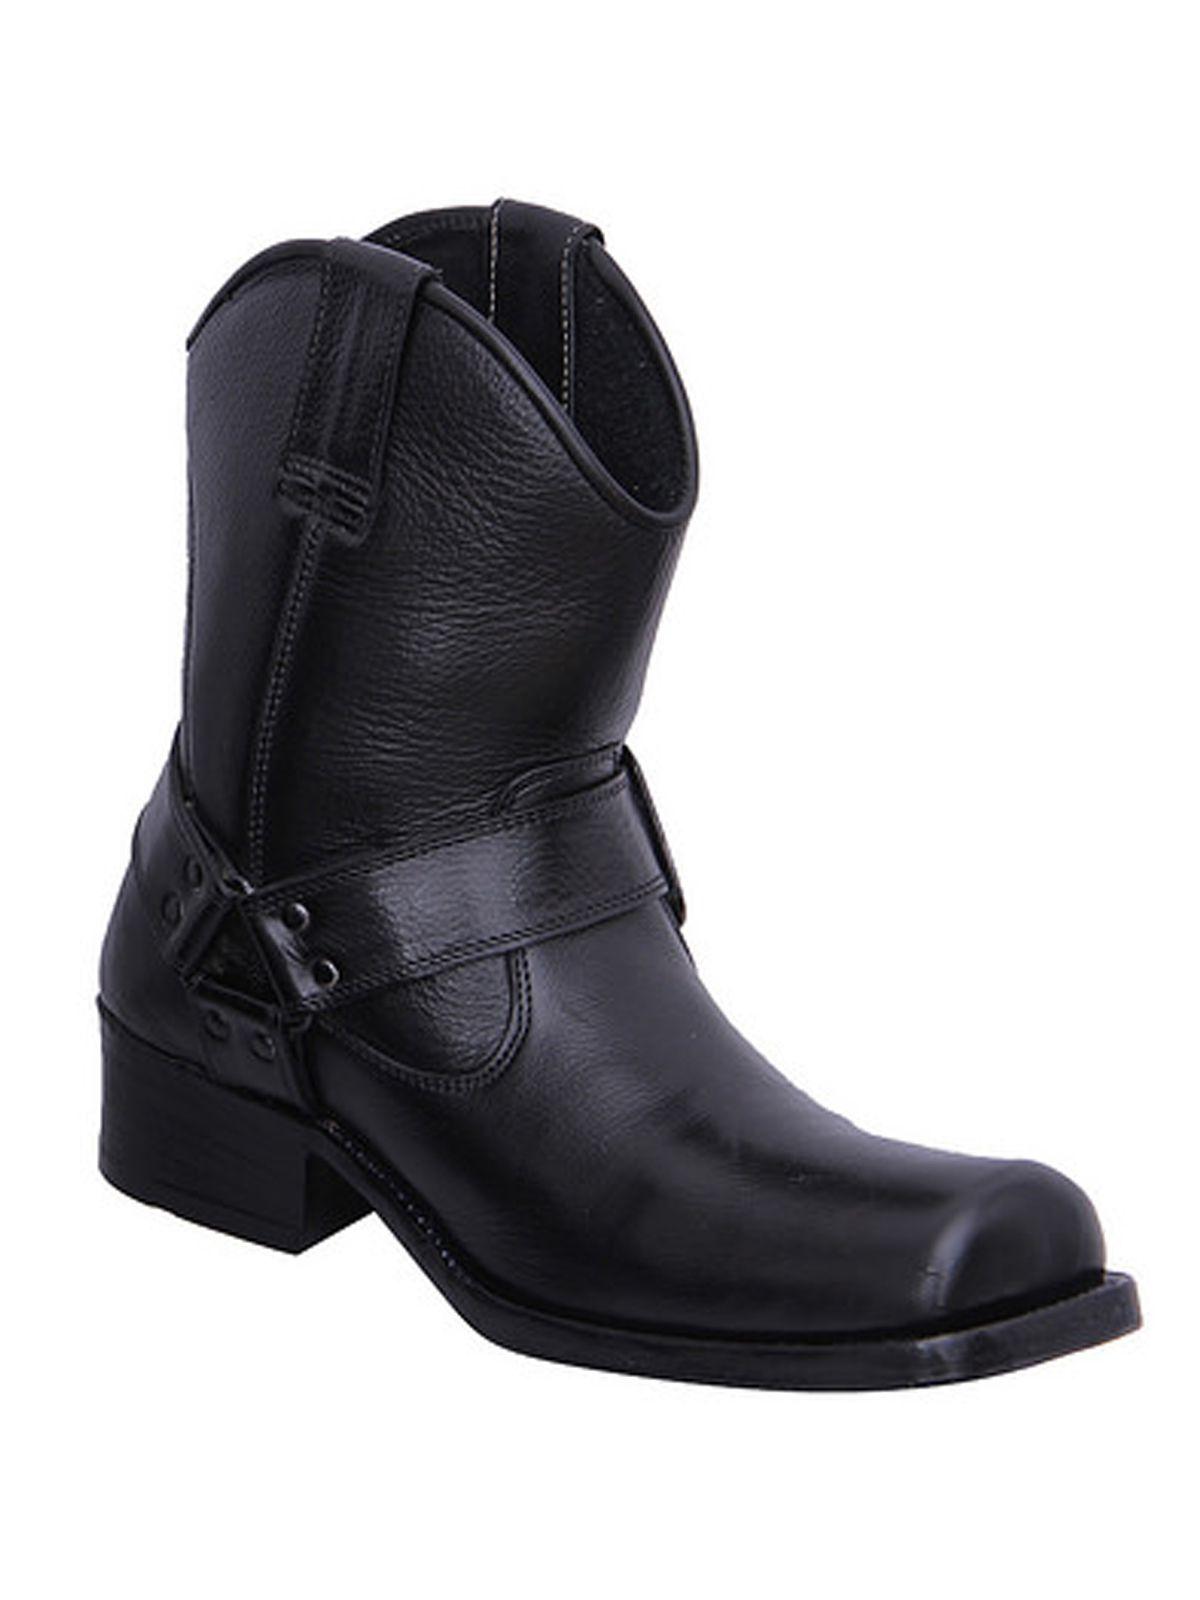 Zardozi Shoes Black Casual Boot